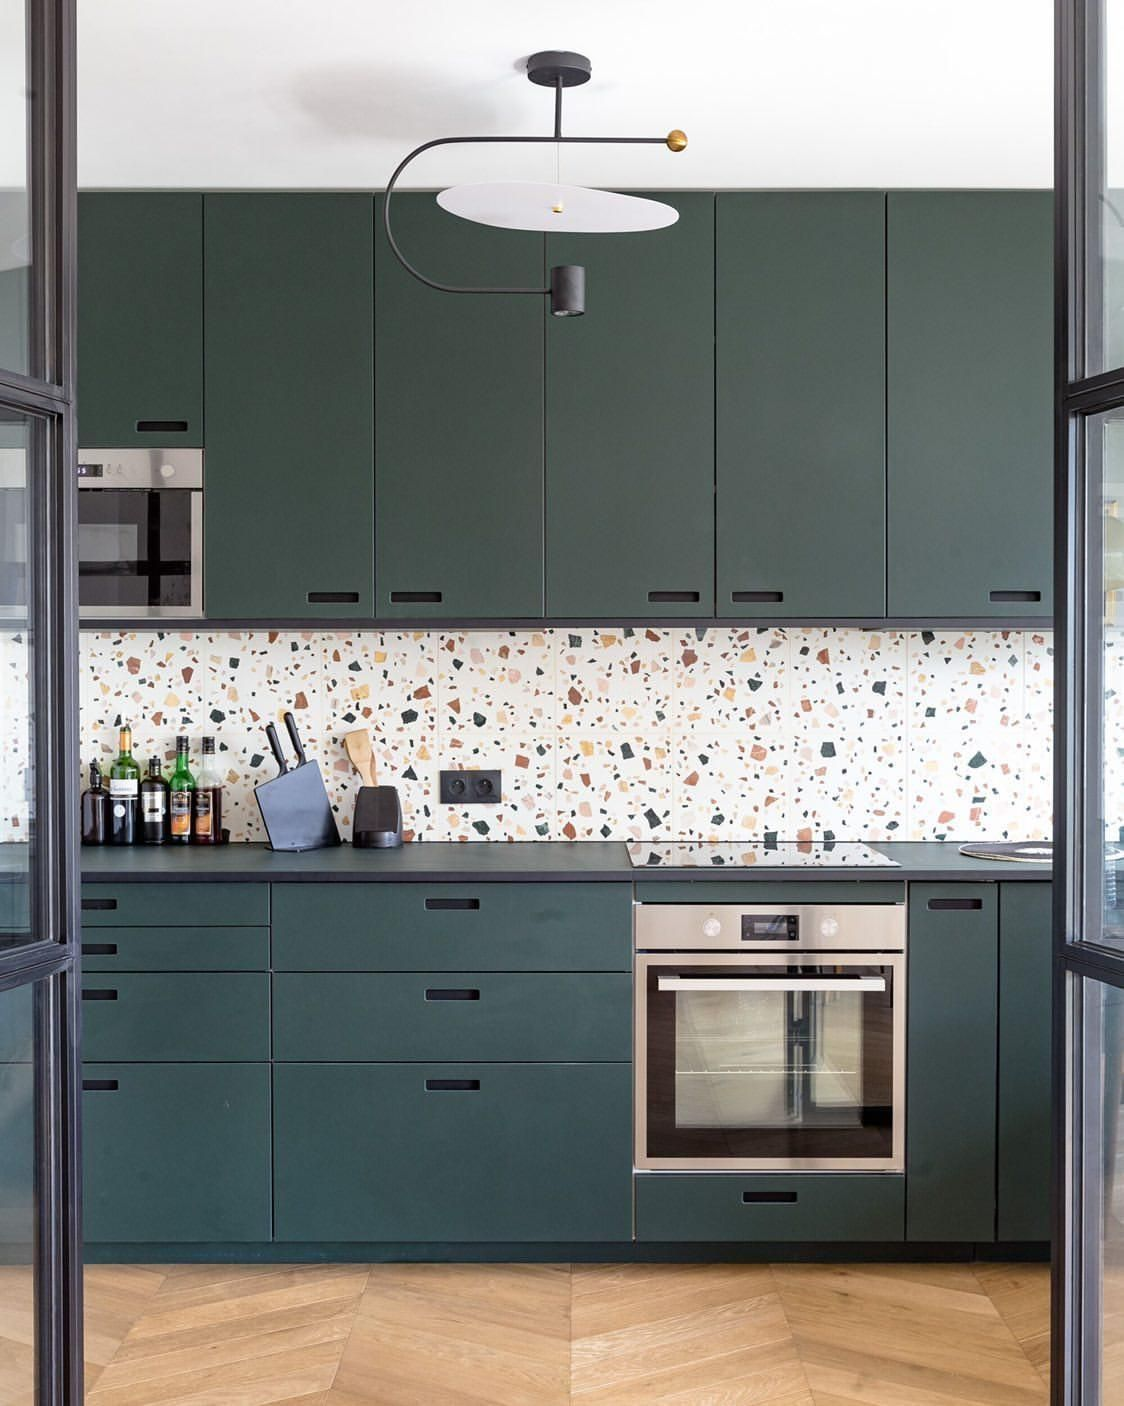 Terrazzo Kitchen Backsplash With Mosaic Factory Wild Terrazzo Tiles Colour W2s The Wild Collection Is Availab Minimalist Kitchen Terrazzo Kitchen Interior